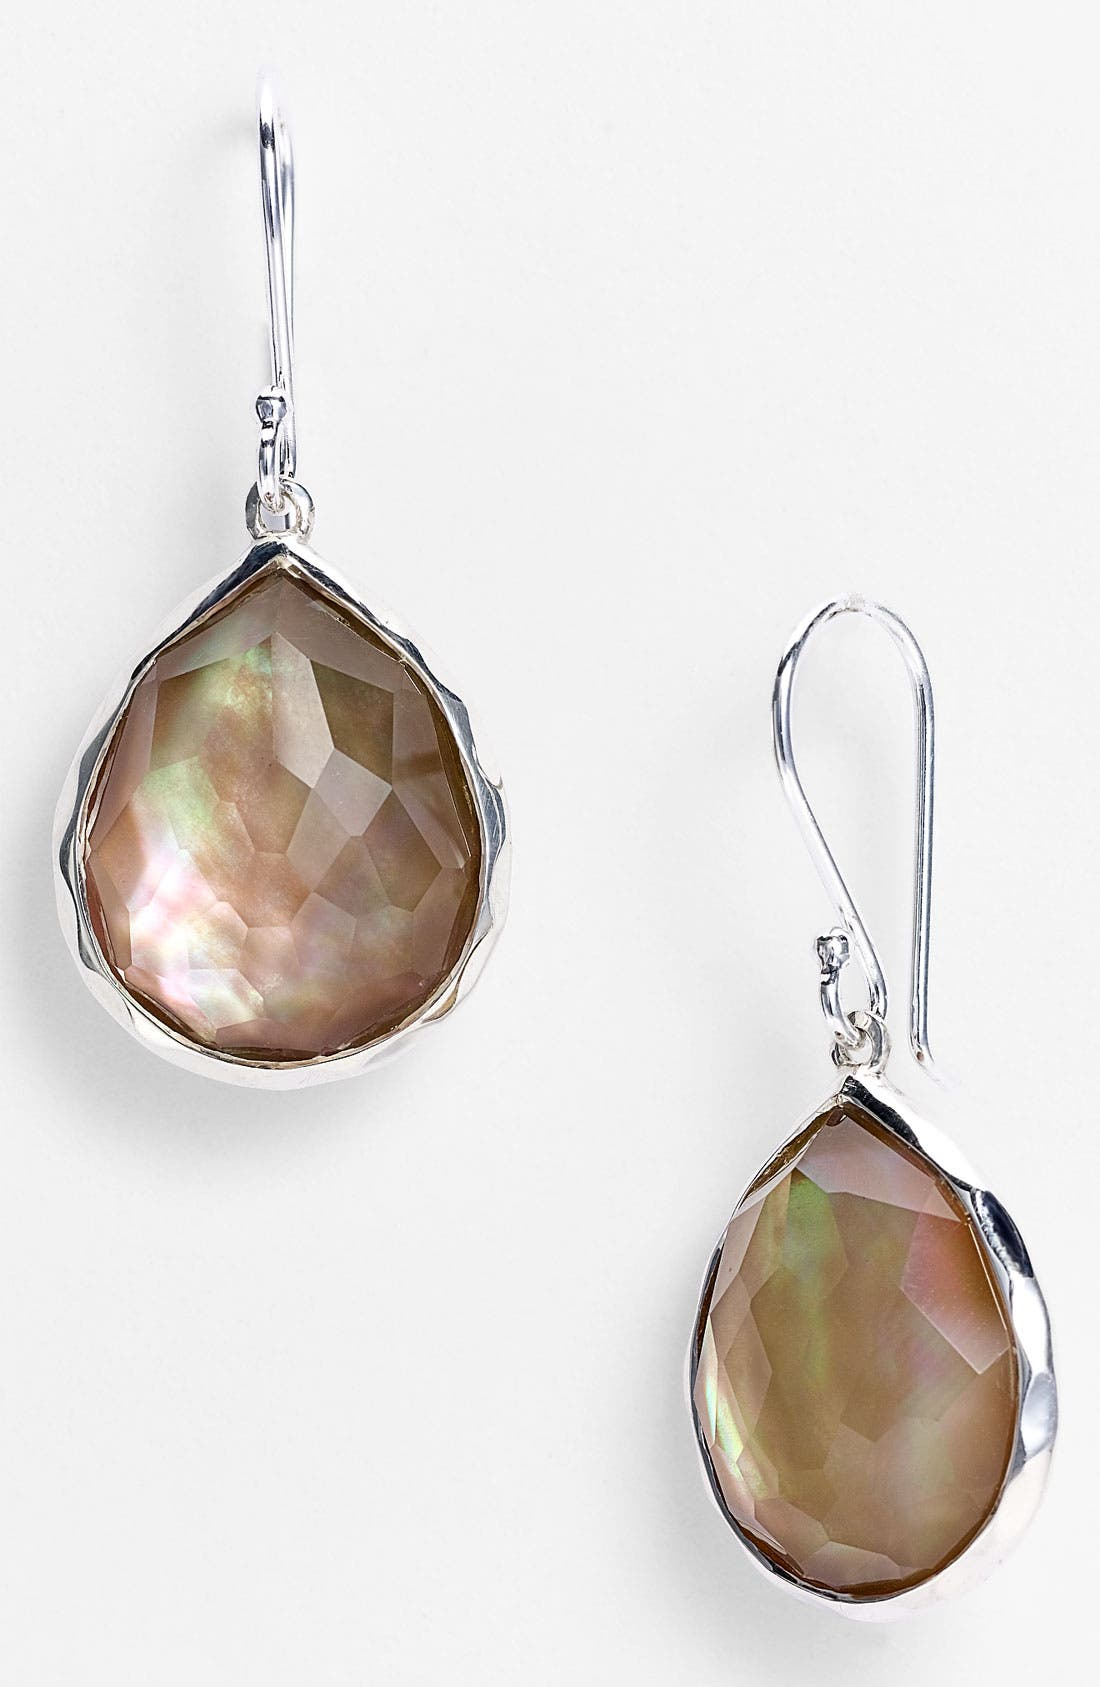 Main Image - Ippolita 'Candy Wonderland' Small Teardrop Earrings